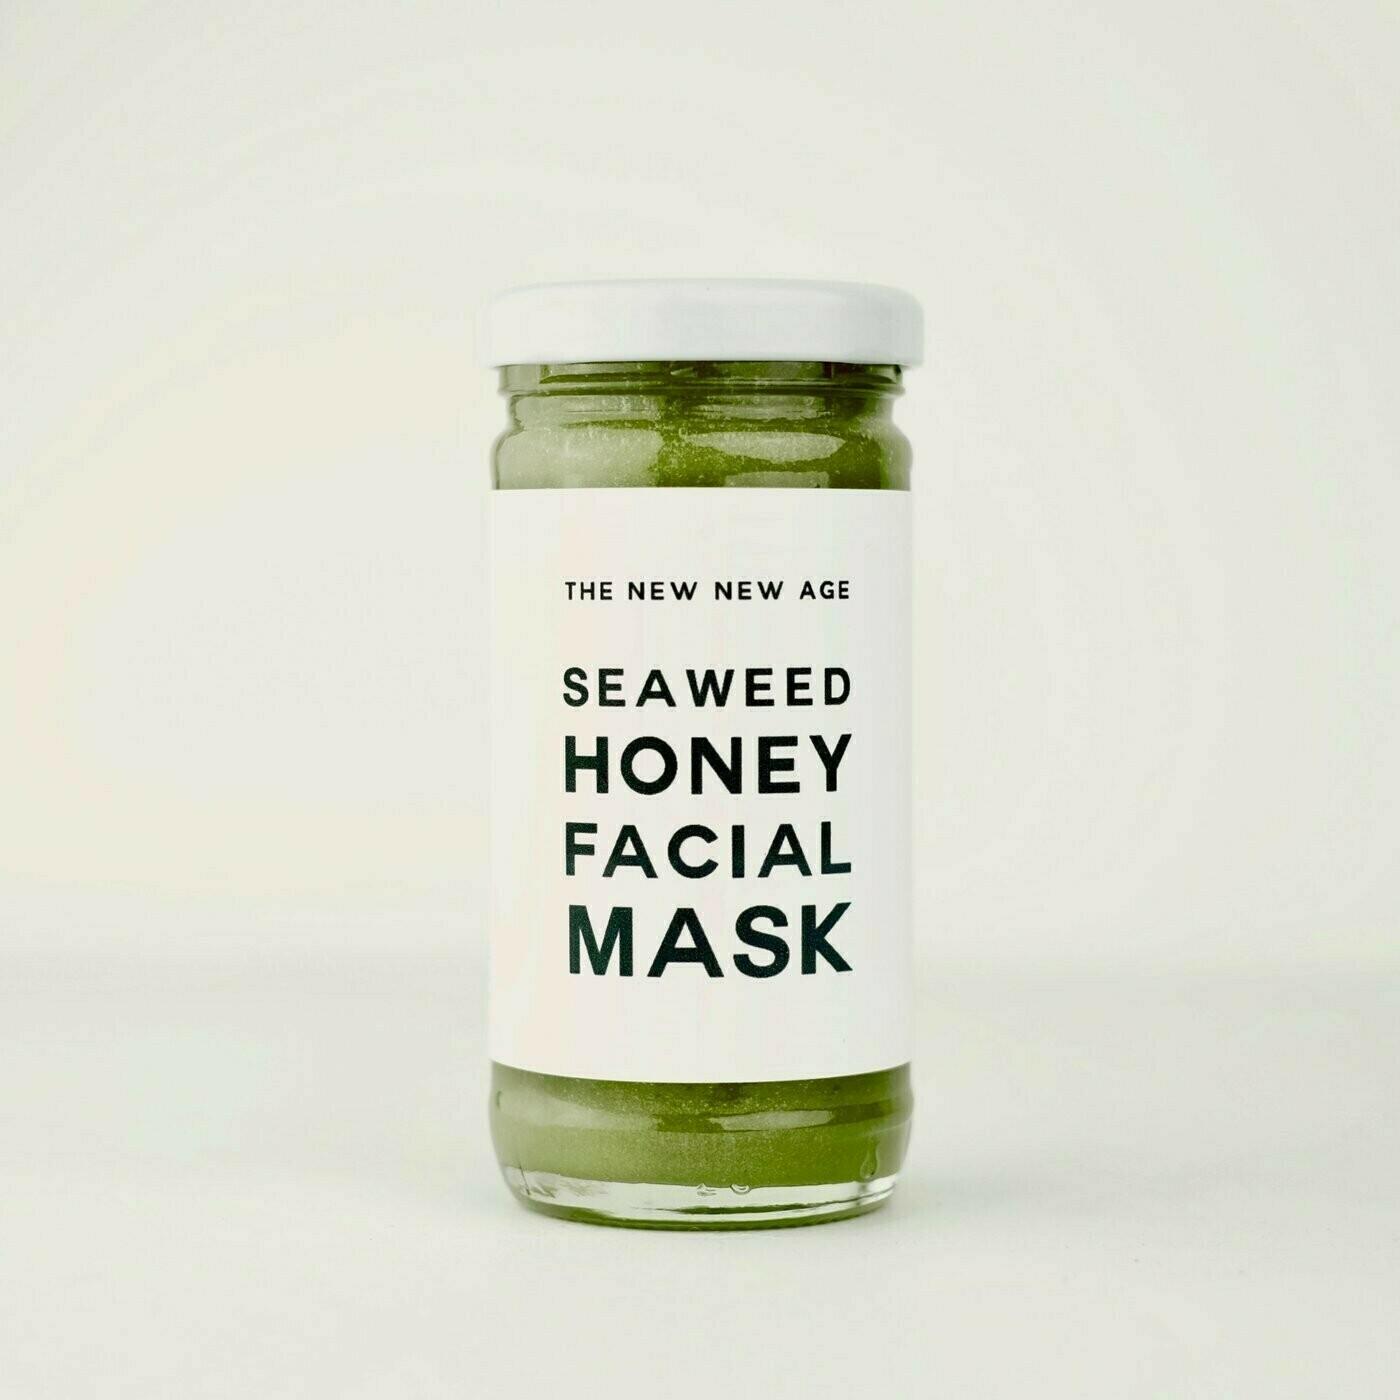 The New New Age Seaweed Honey Mask